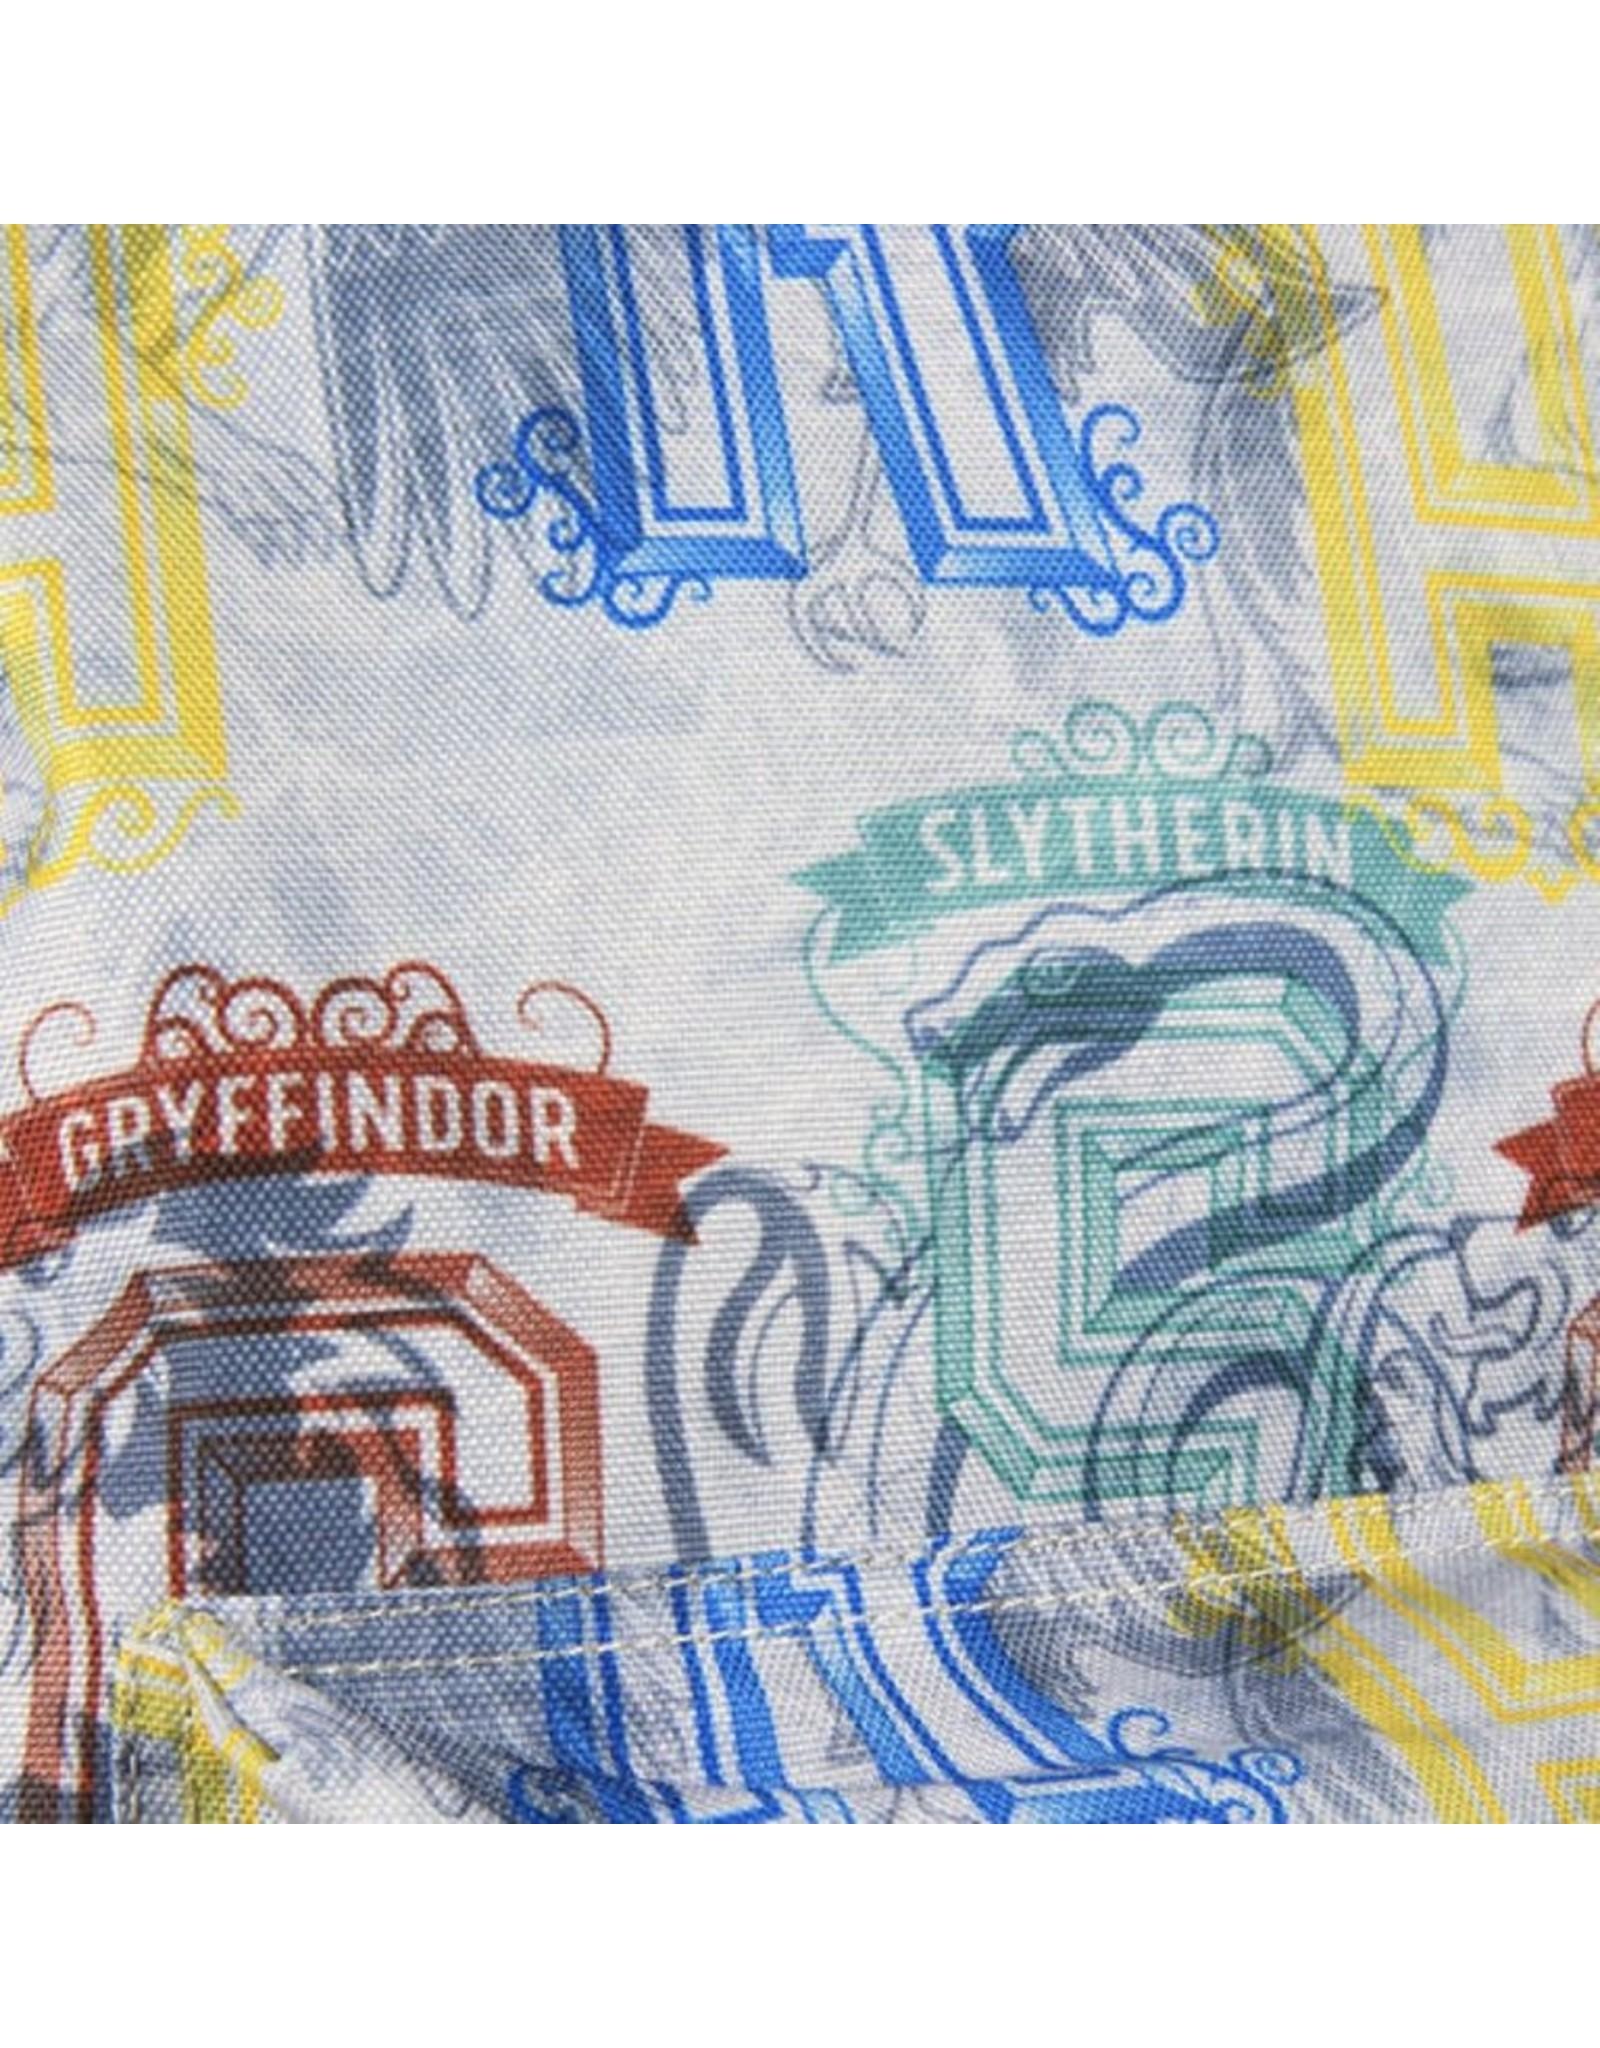 Harry Potter Harry Potter tassen - Harry Potter fantasy rugzak 41cm